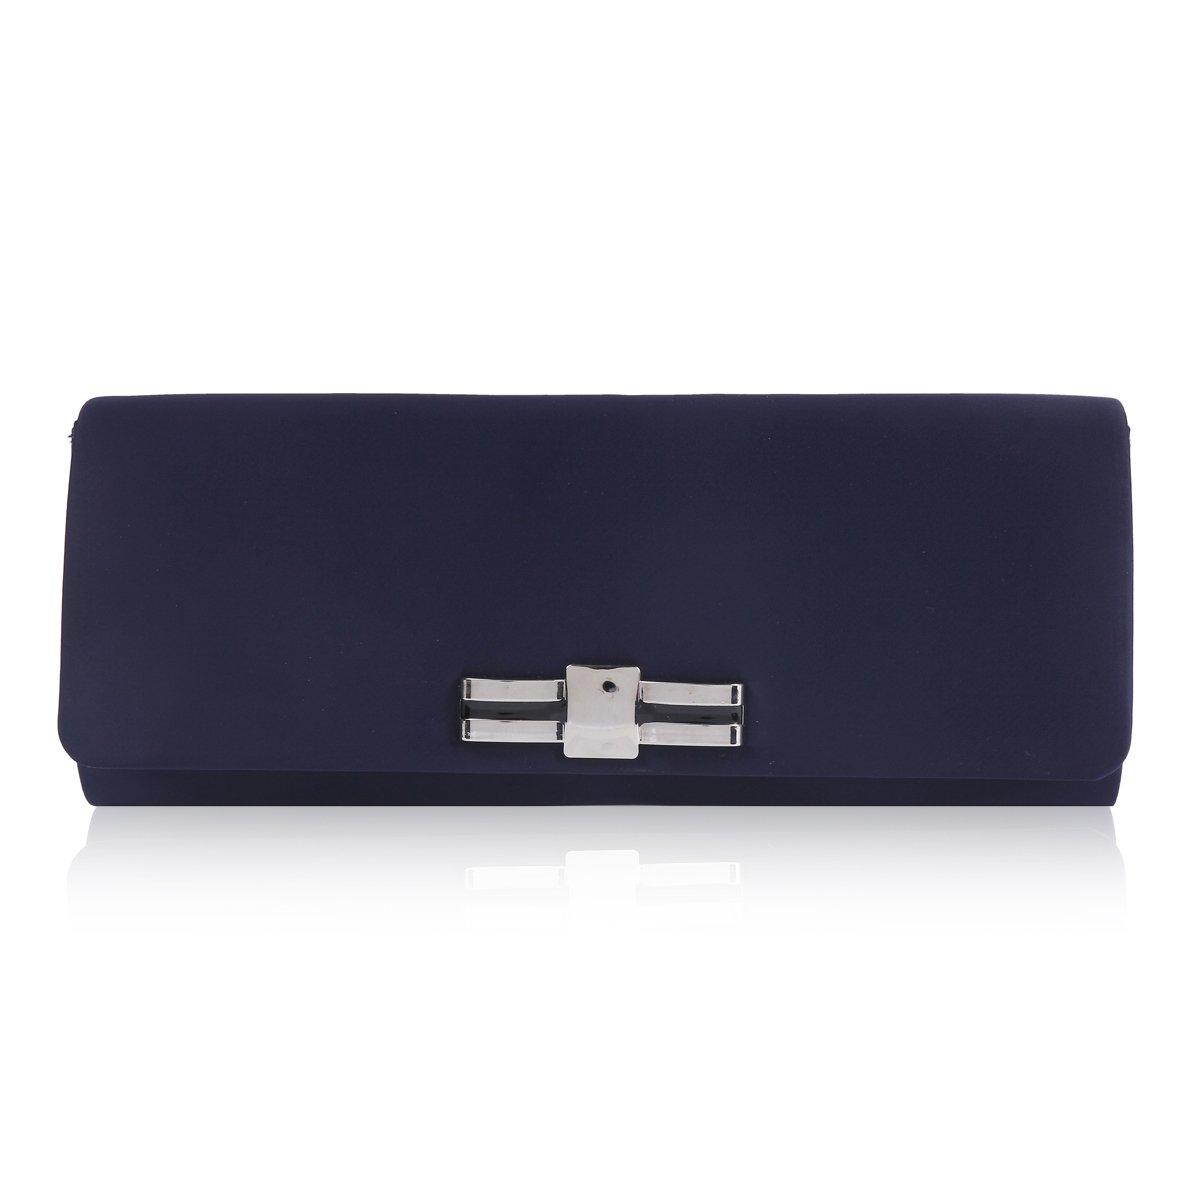 Damara Womens Elegant Simple Smooth Clutch Evening Party Bag,Navy Blue